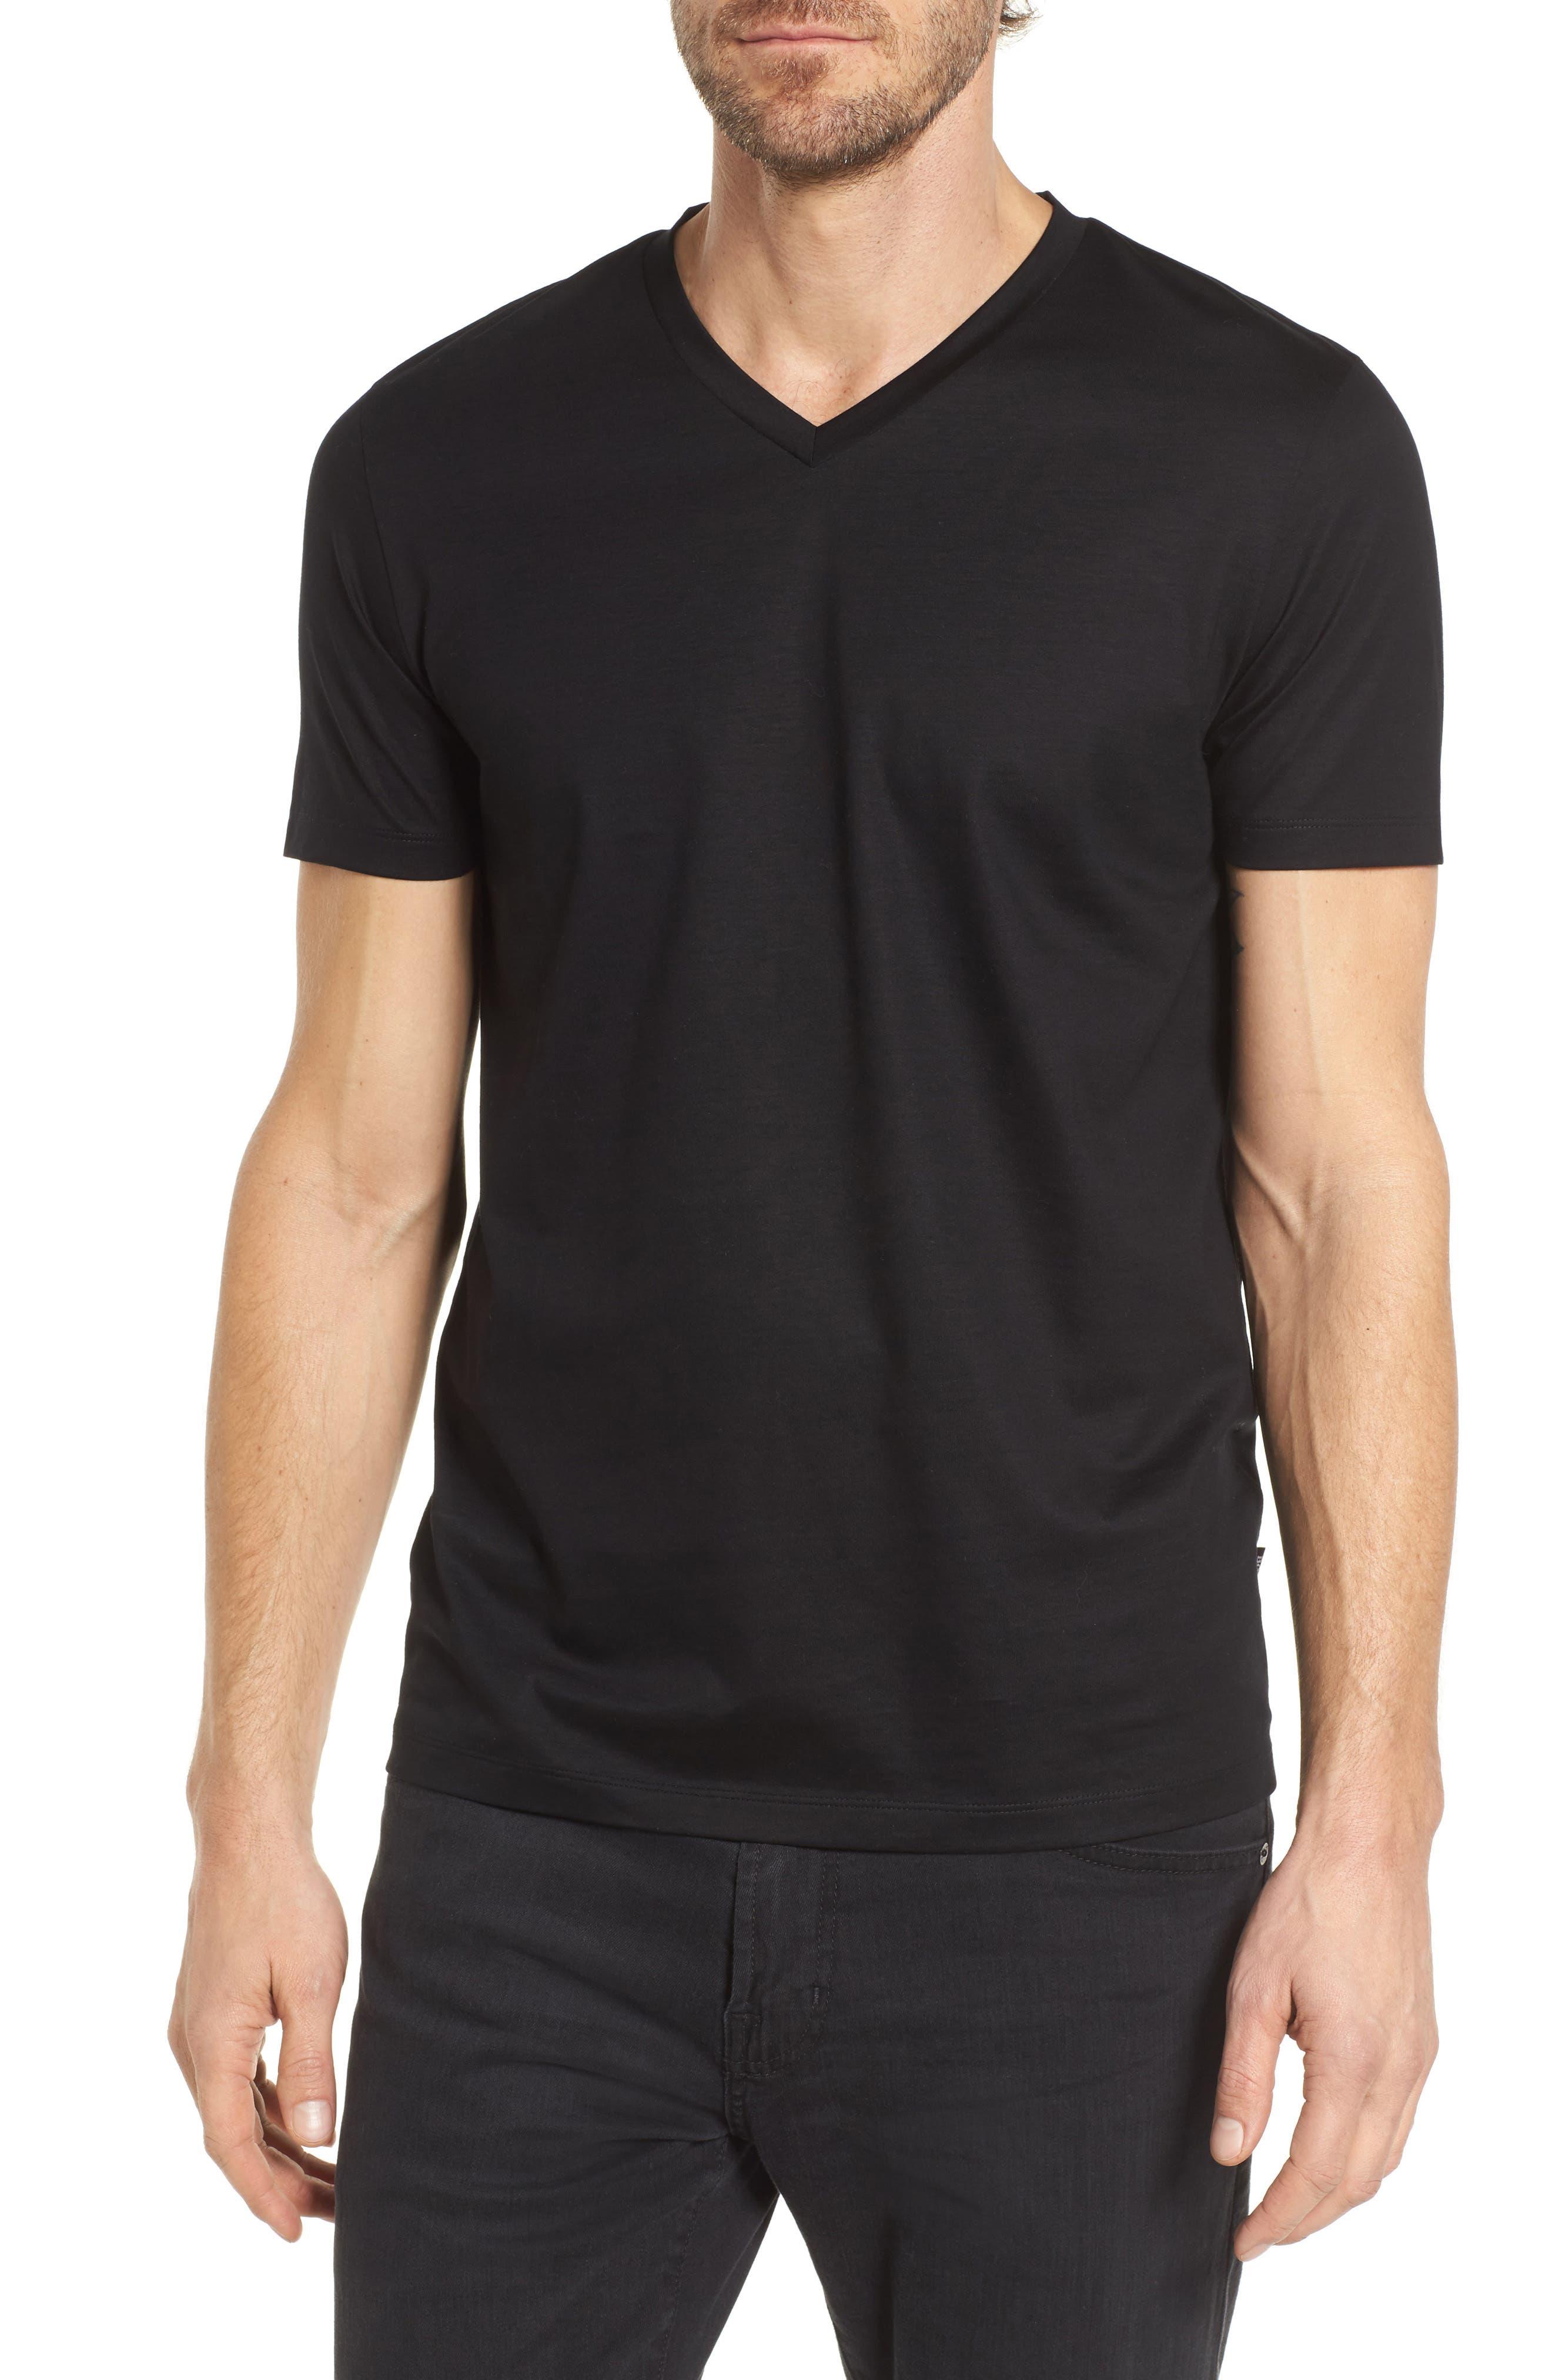 BOSS Teal Slim Fit V-Neck T-Shirt